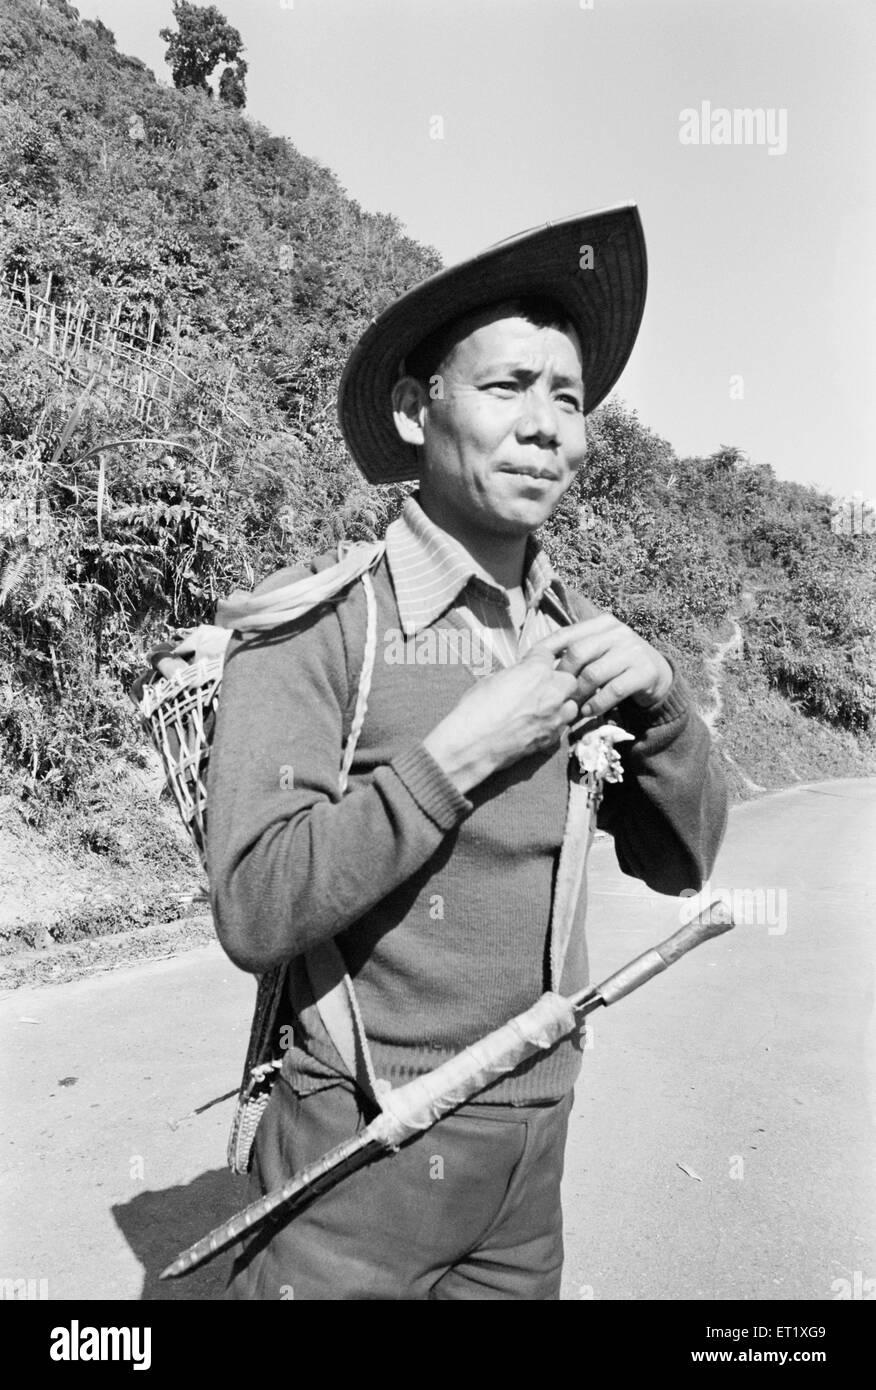 Member of Hill Miri tribe ; Arunachal Pradesh ; India 1982 NO MR - Stock Image